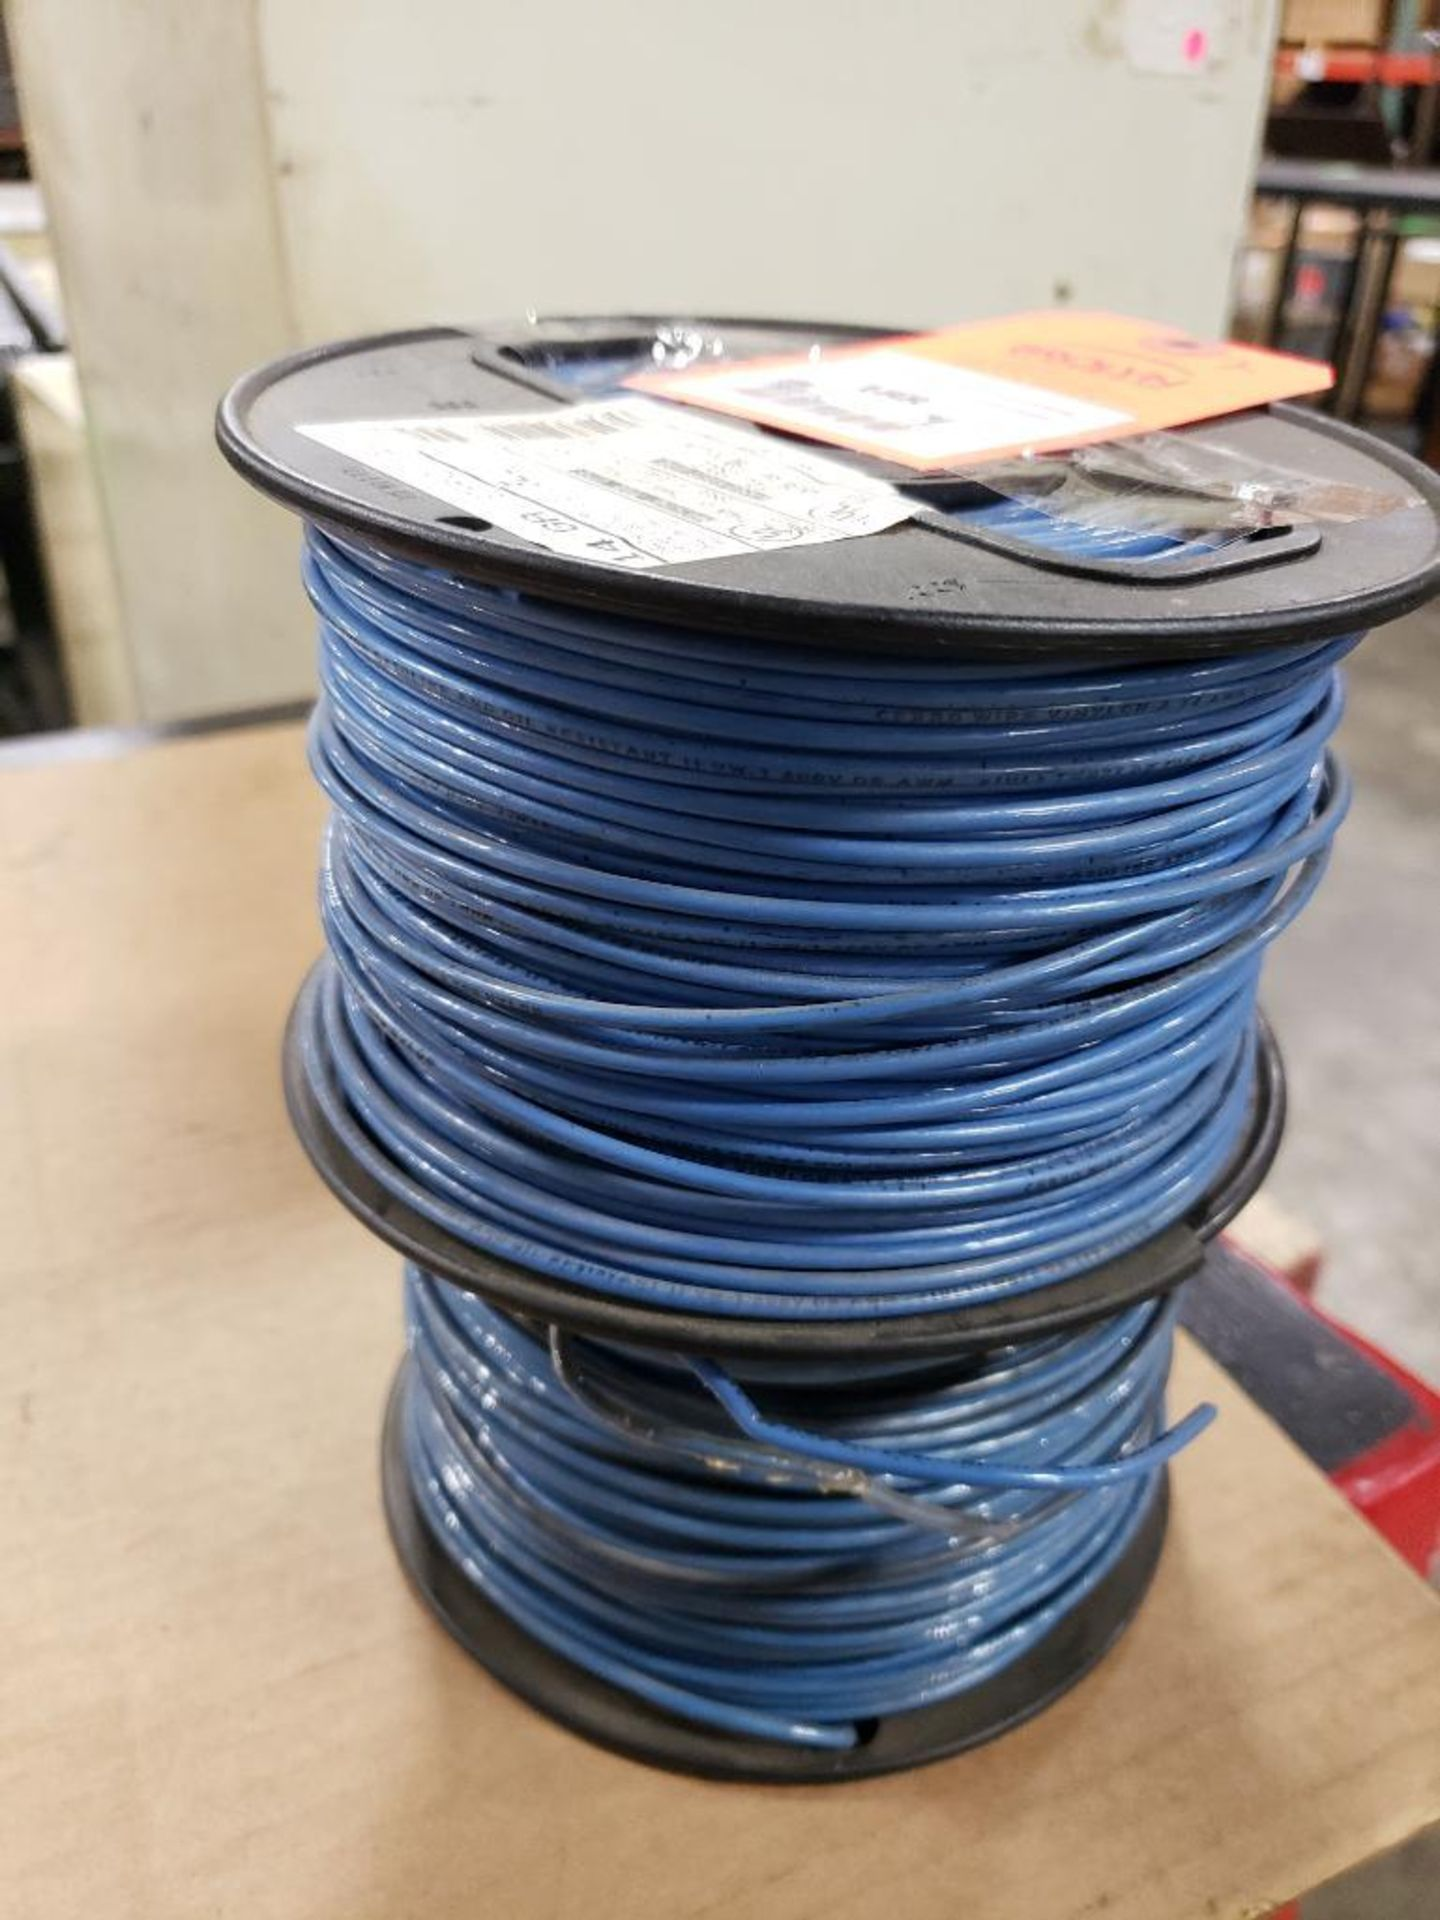 Qty 2 - Spool of Hewlett contractor wire. 14GA-BLUE.